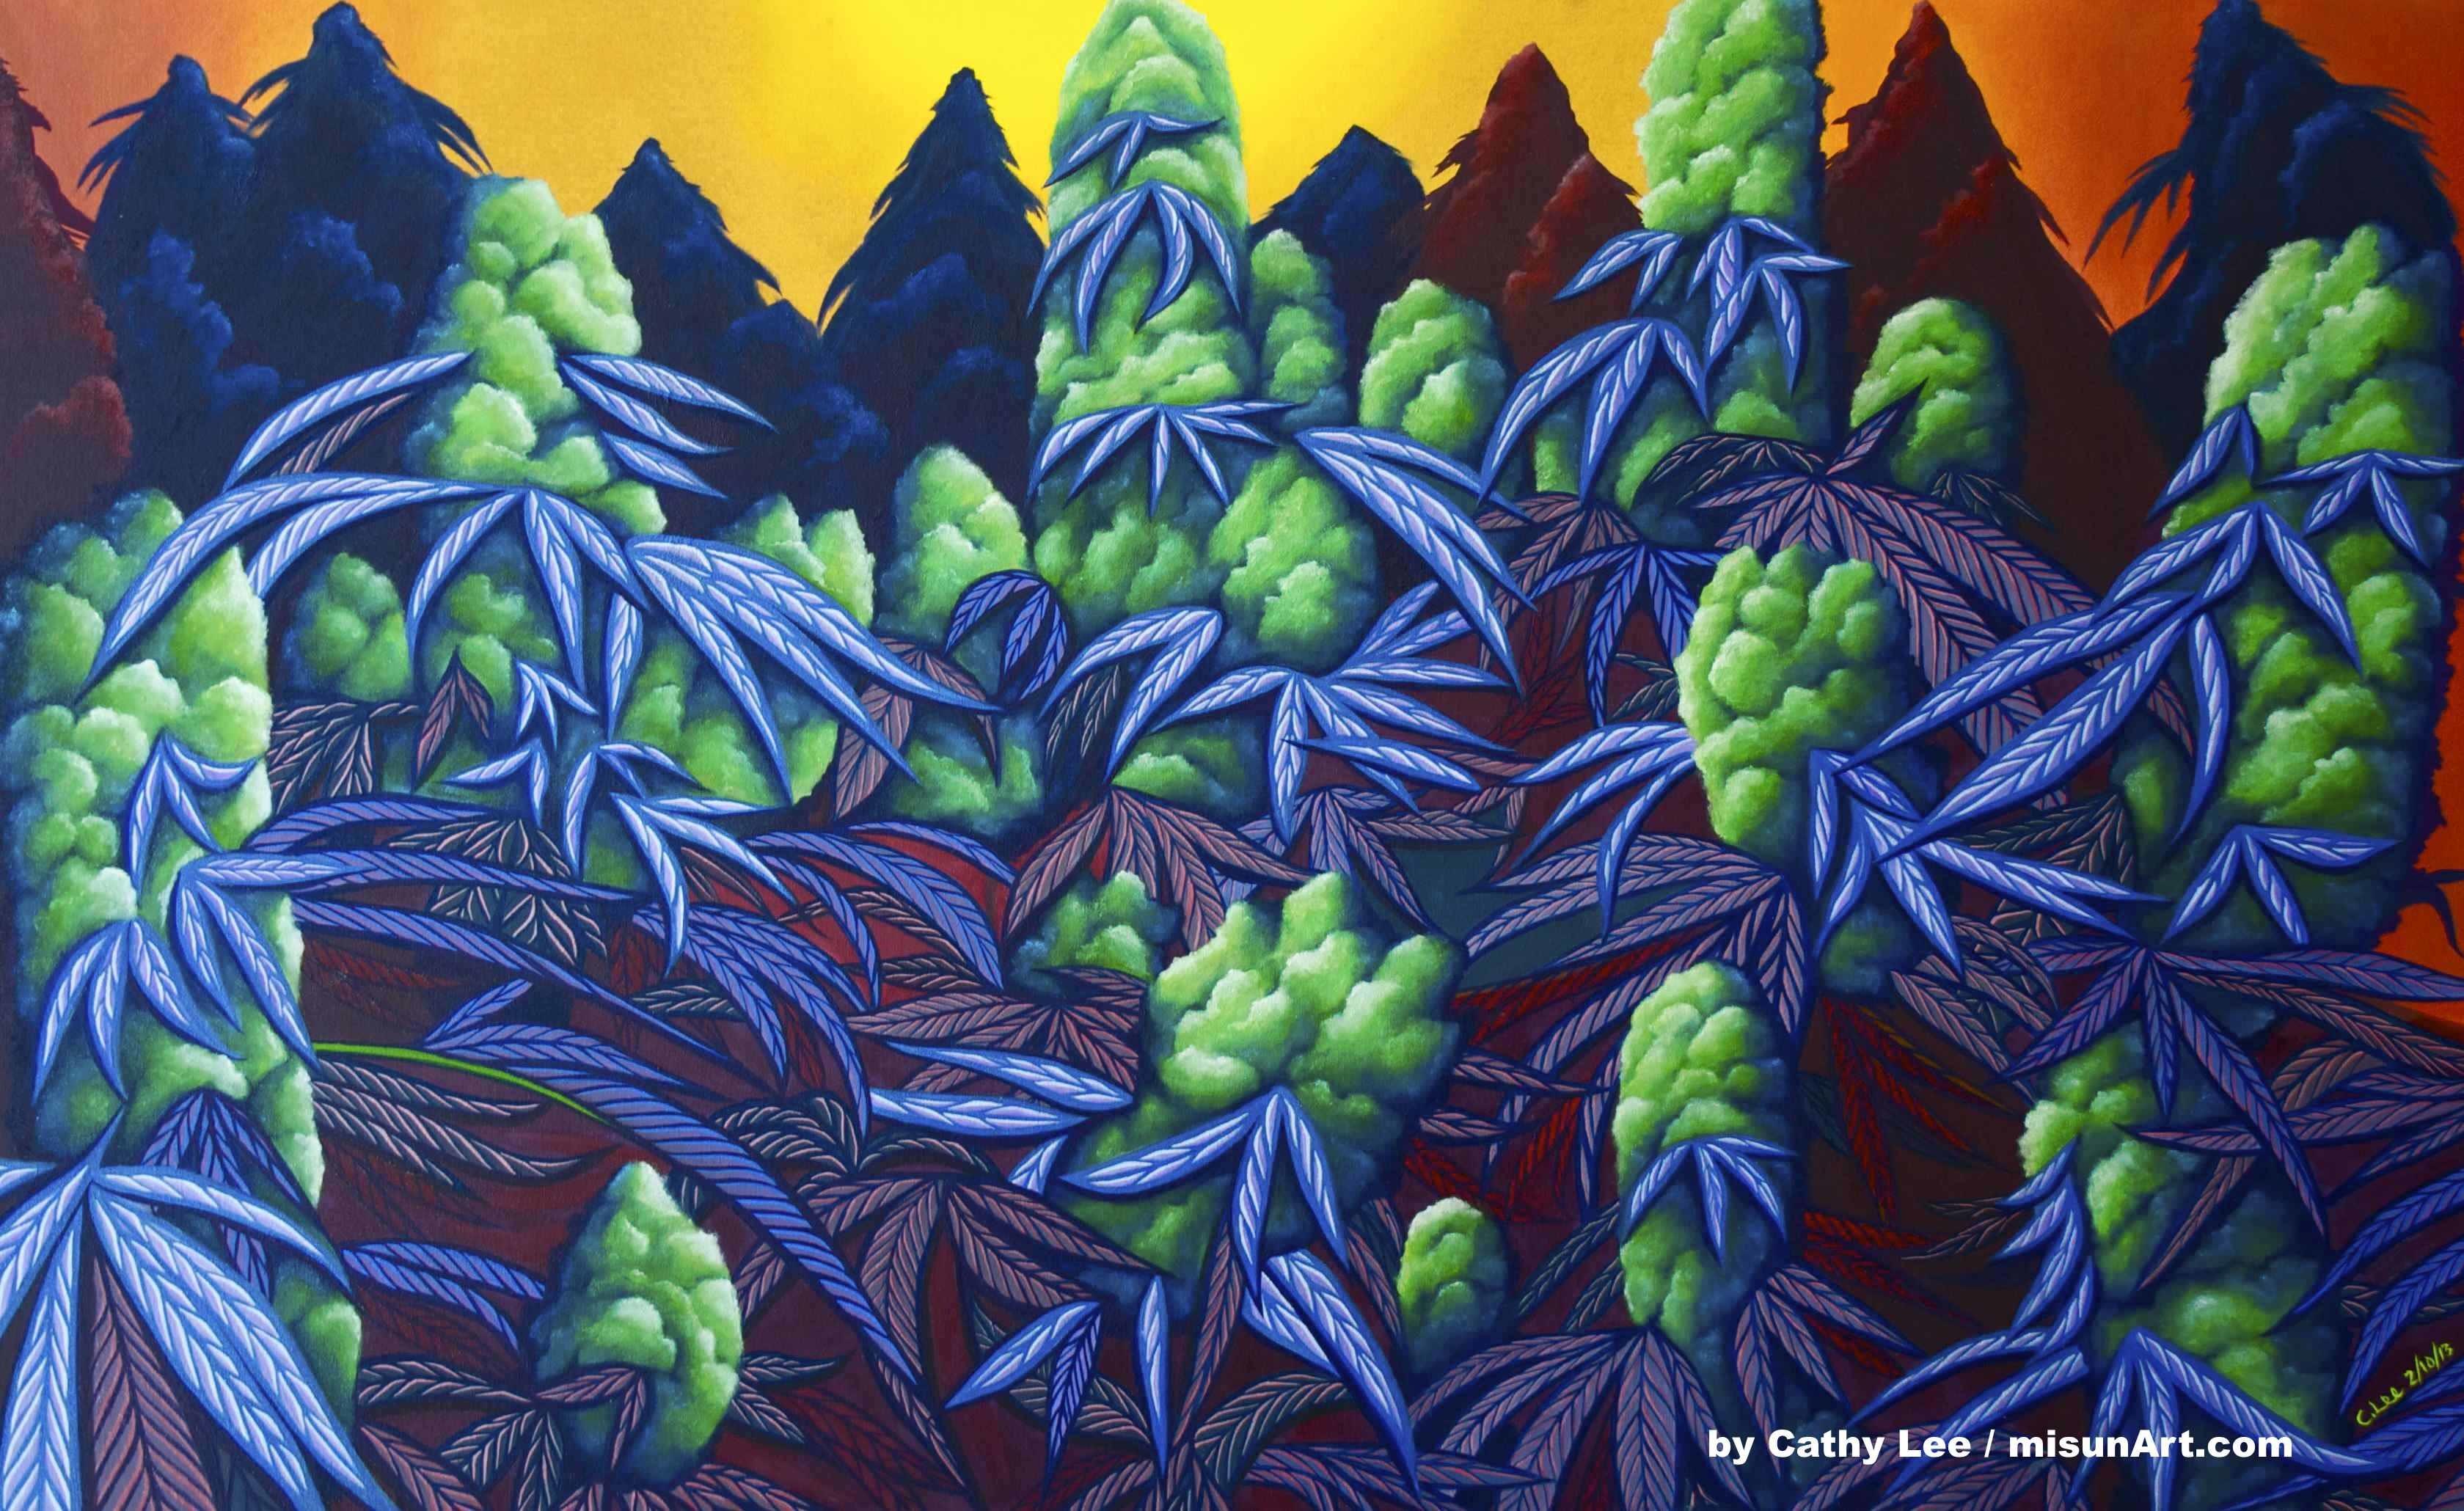 Cathy Lee – Featured Marijuana Artist – Stoner Artwork